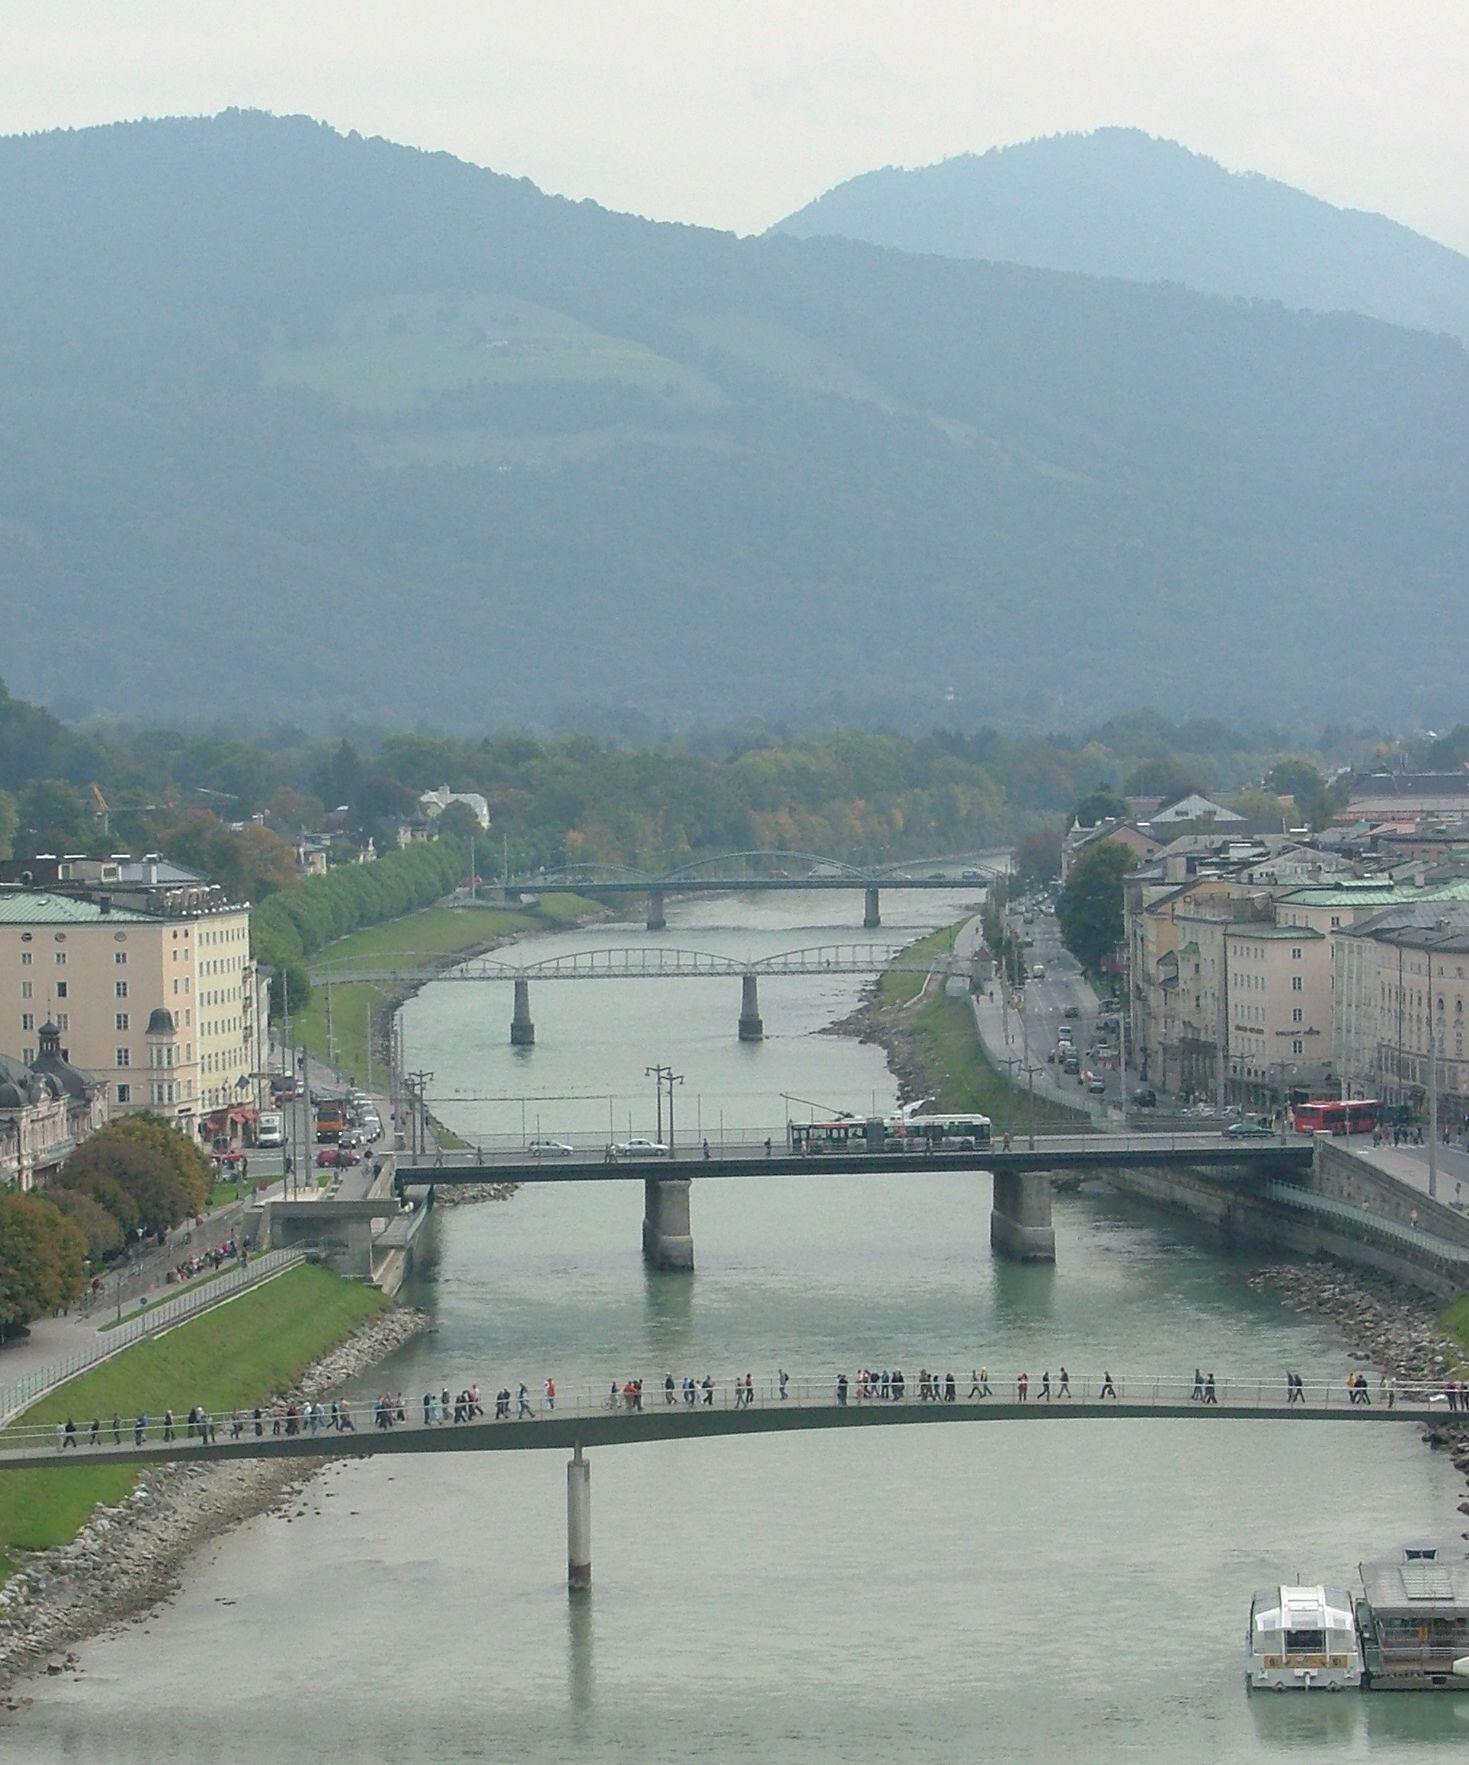 Five bridges crossing the Salzach River at Salzburg